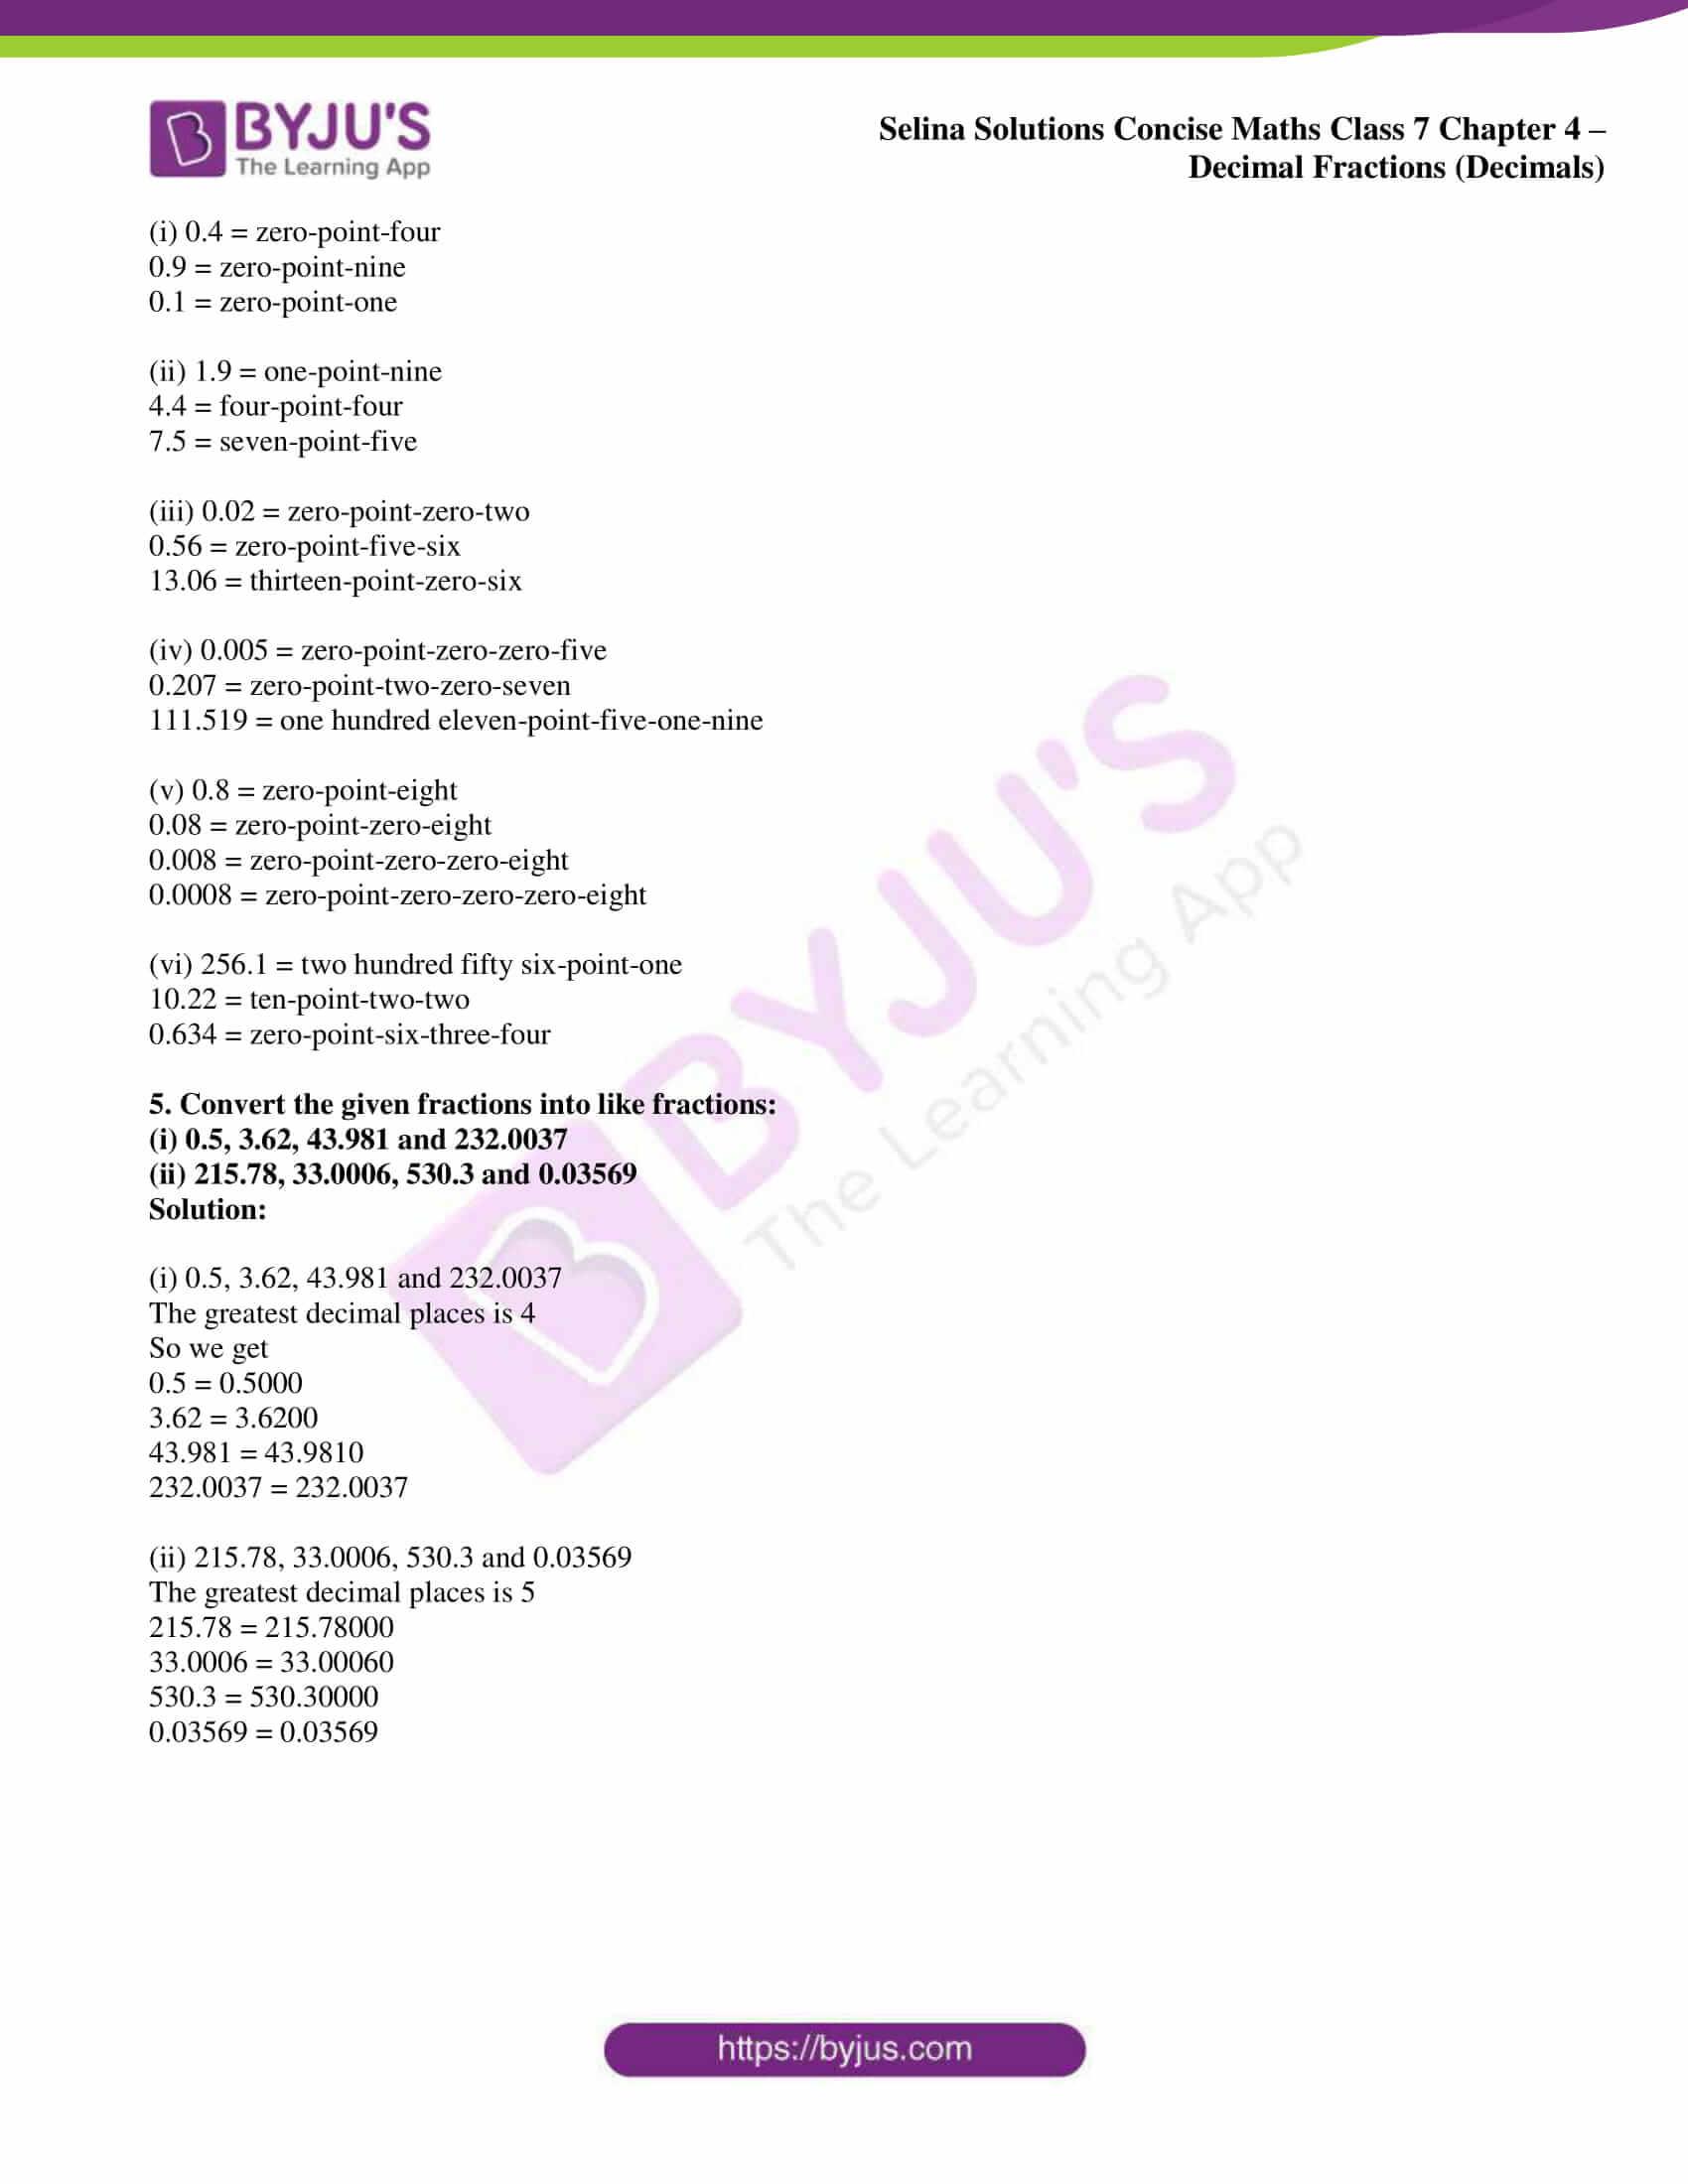 selina sol concise maths class 7 ch4 ex 4a 5